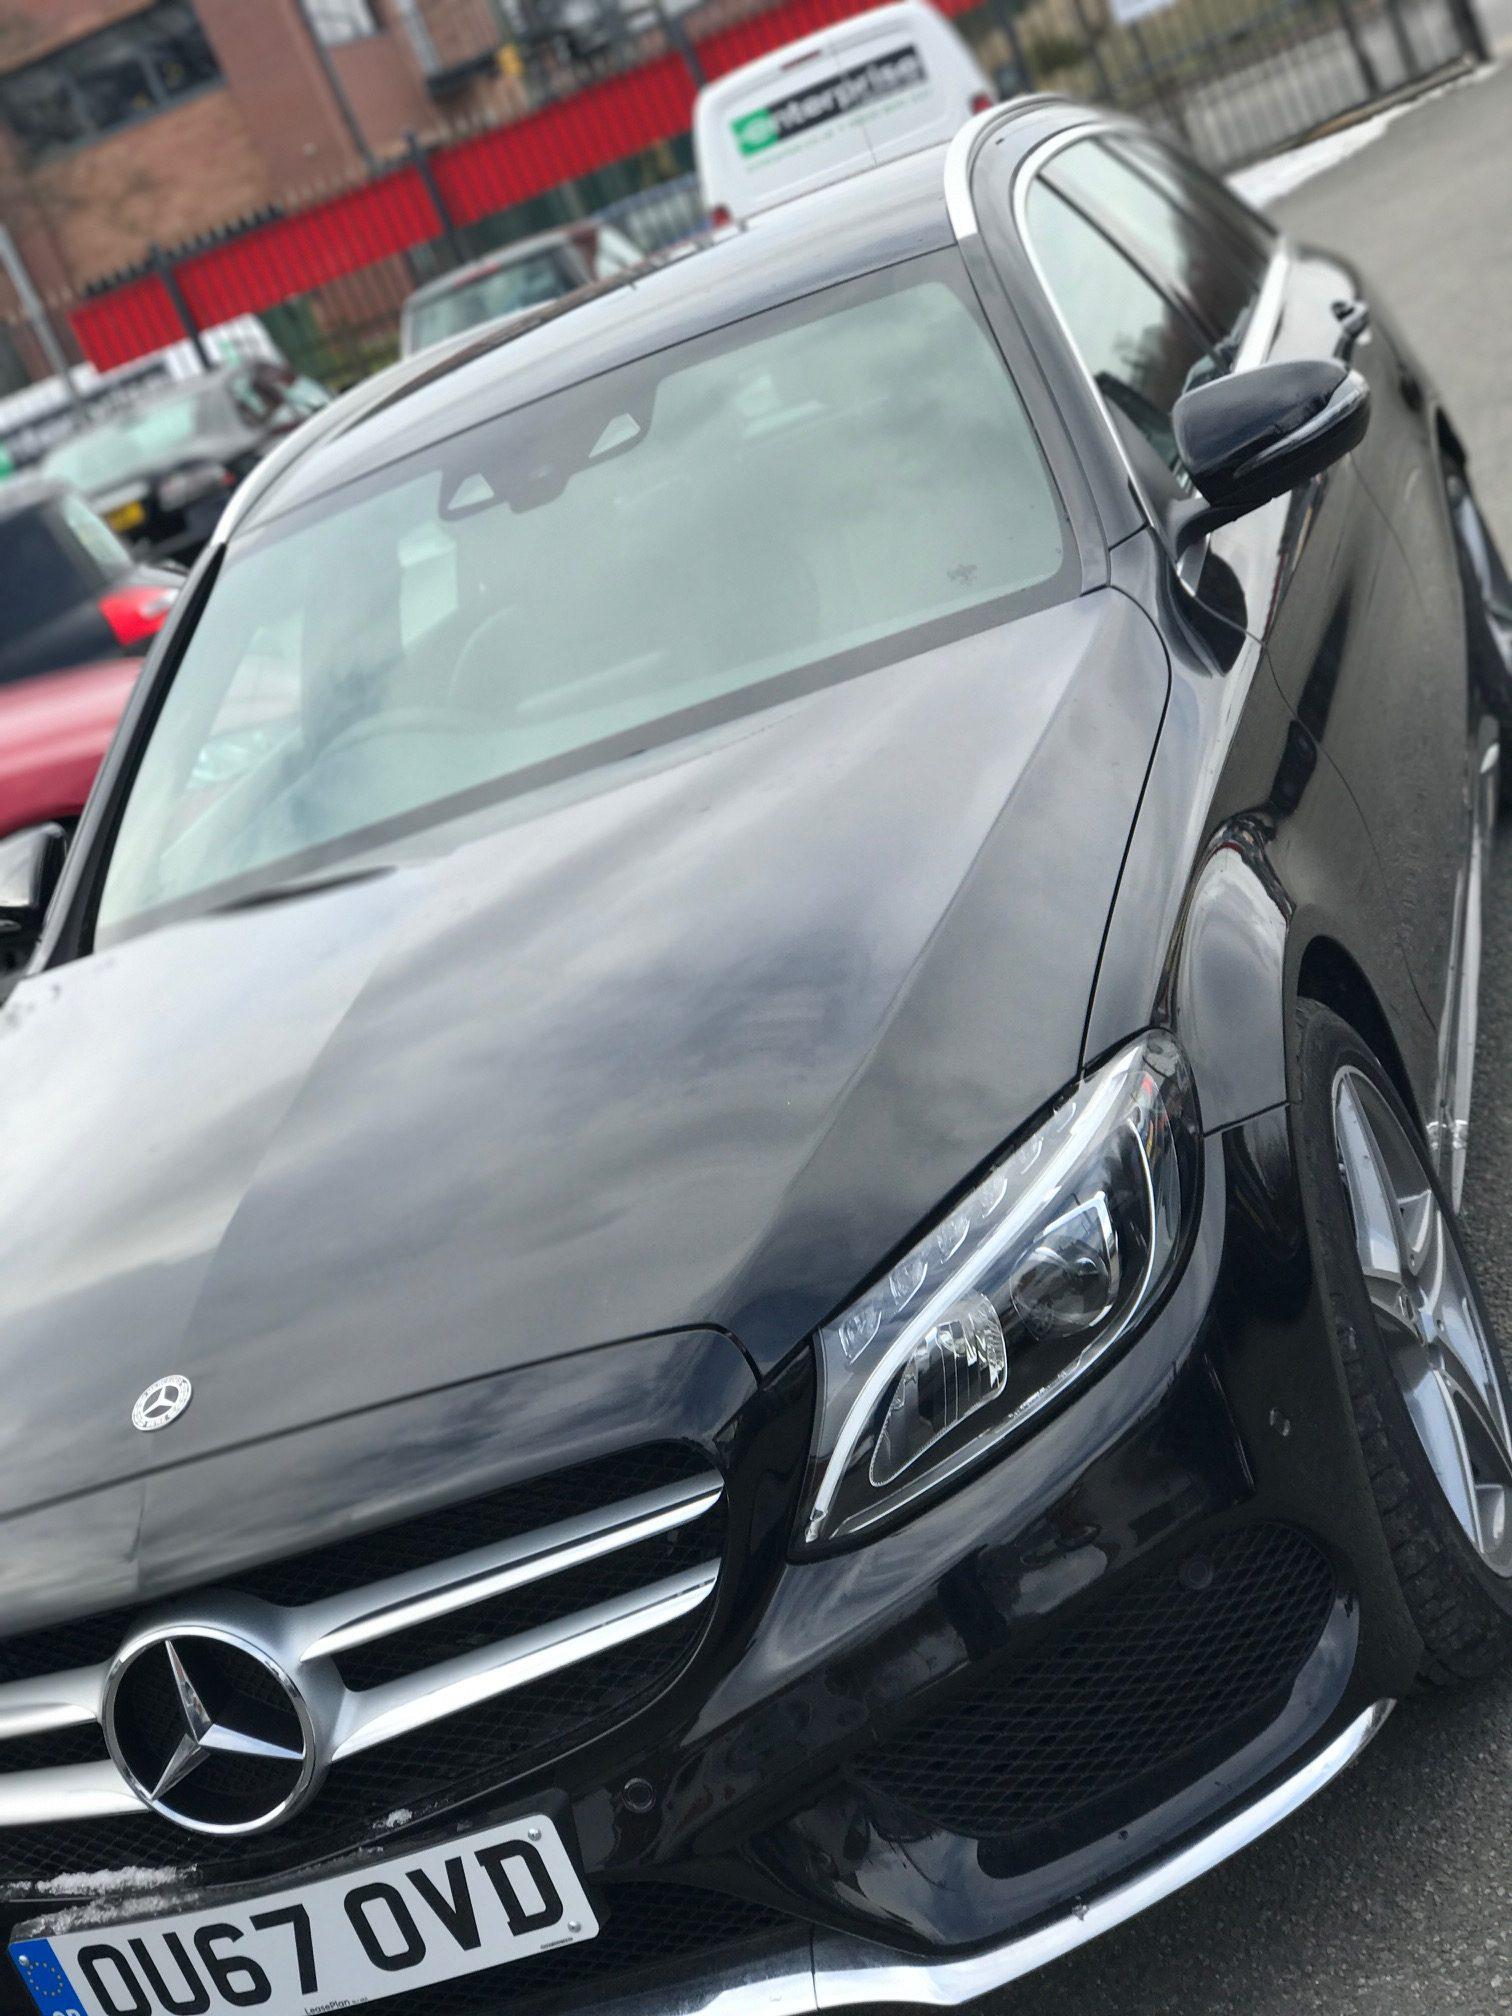 Mercedes-Benz C CLASS DIESEL ESTATE C220d AMG Line 5 door 9G-Tronic (Auto) Car Leasing Luxury